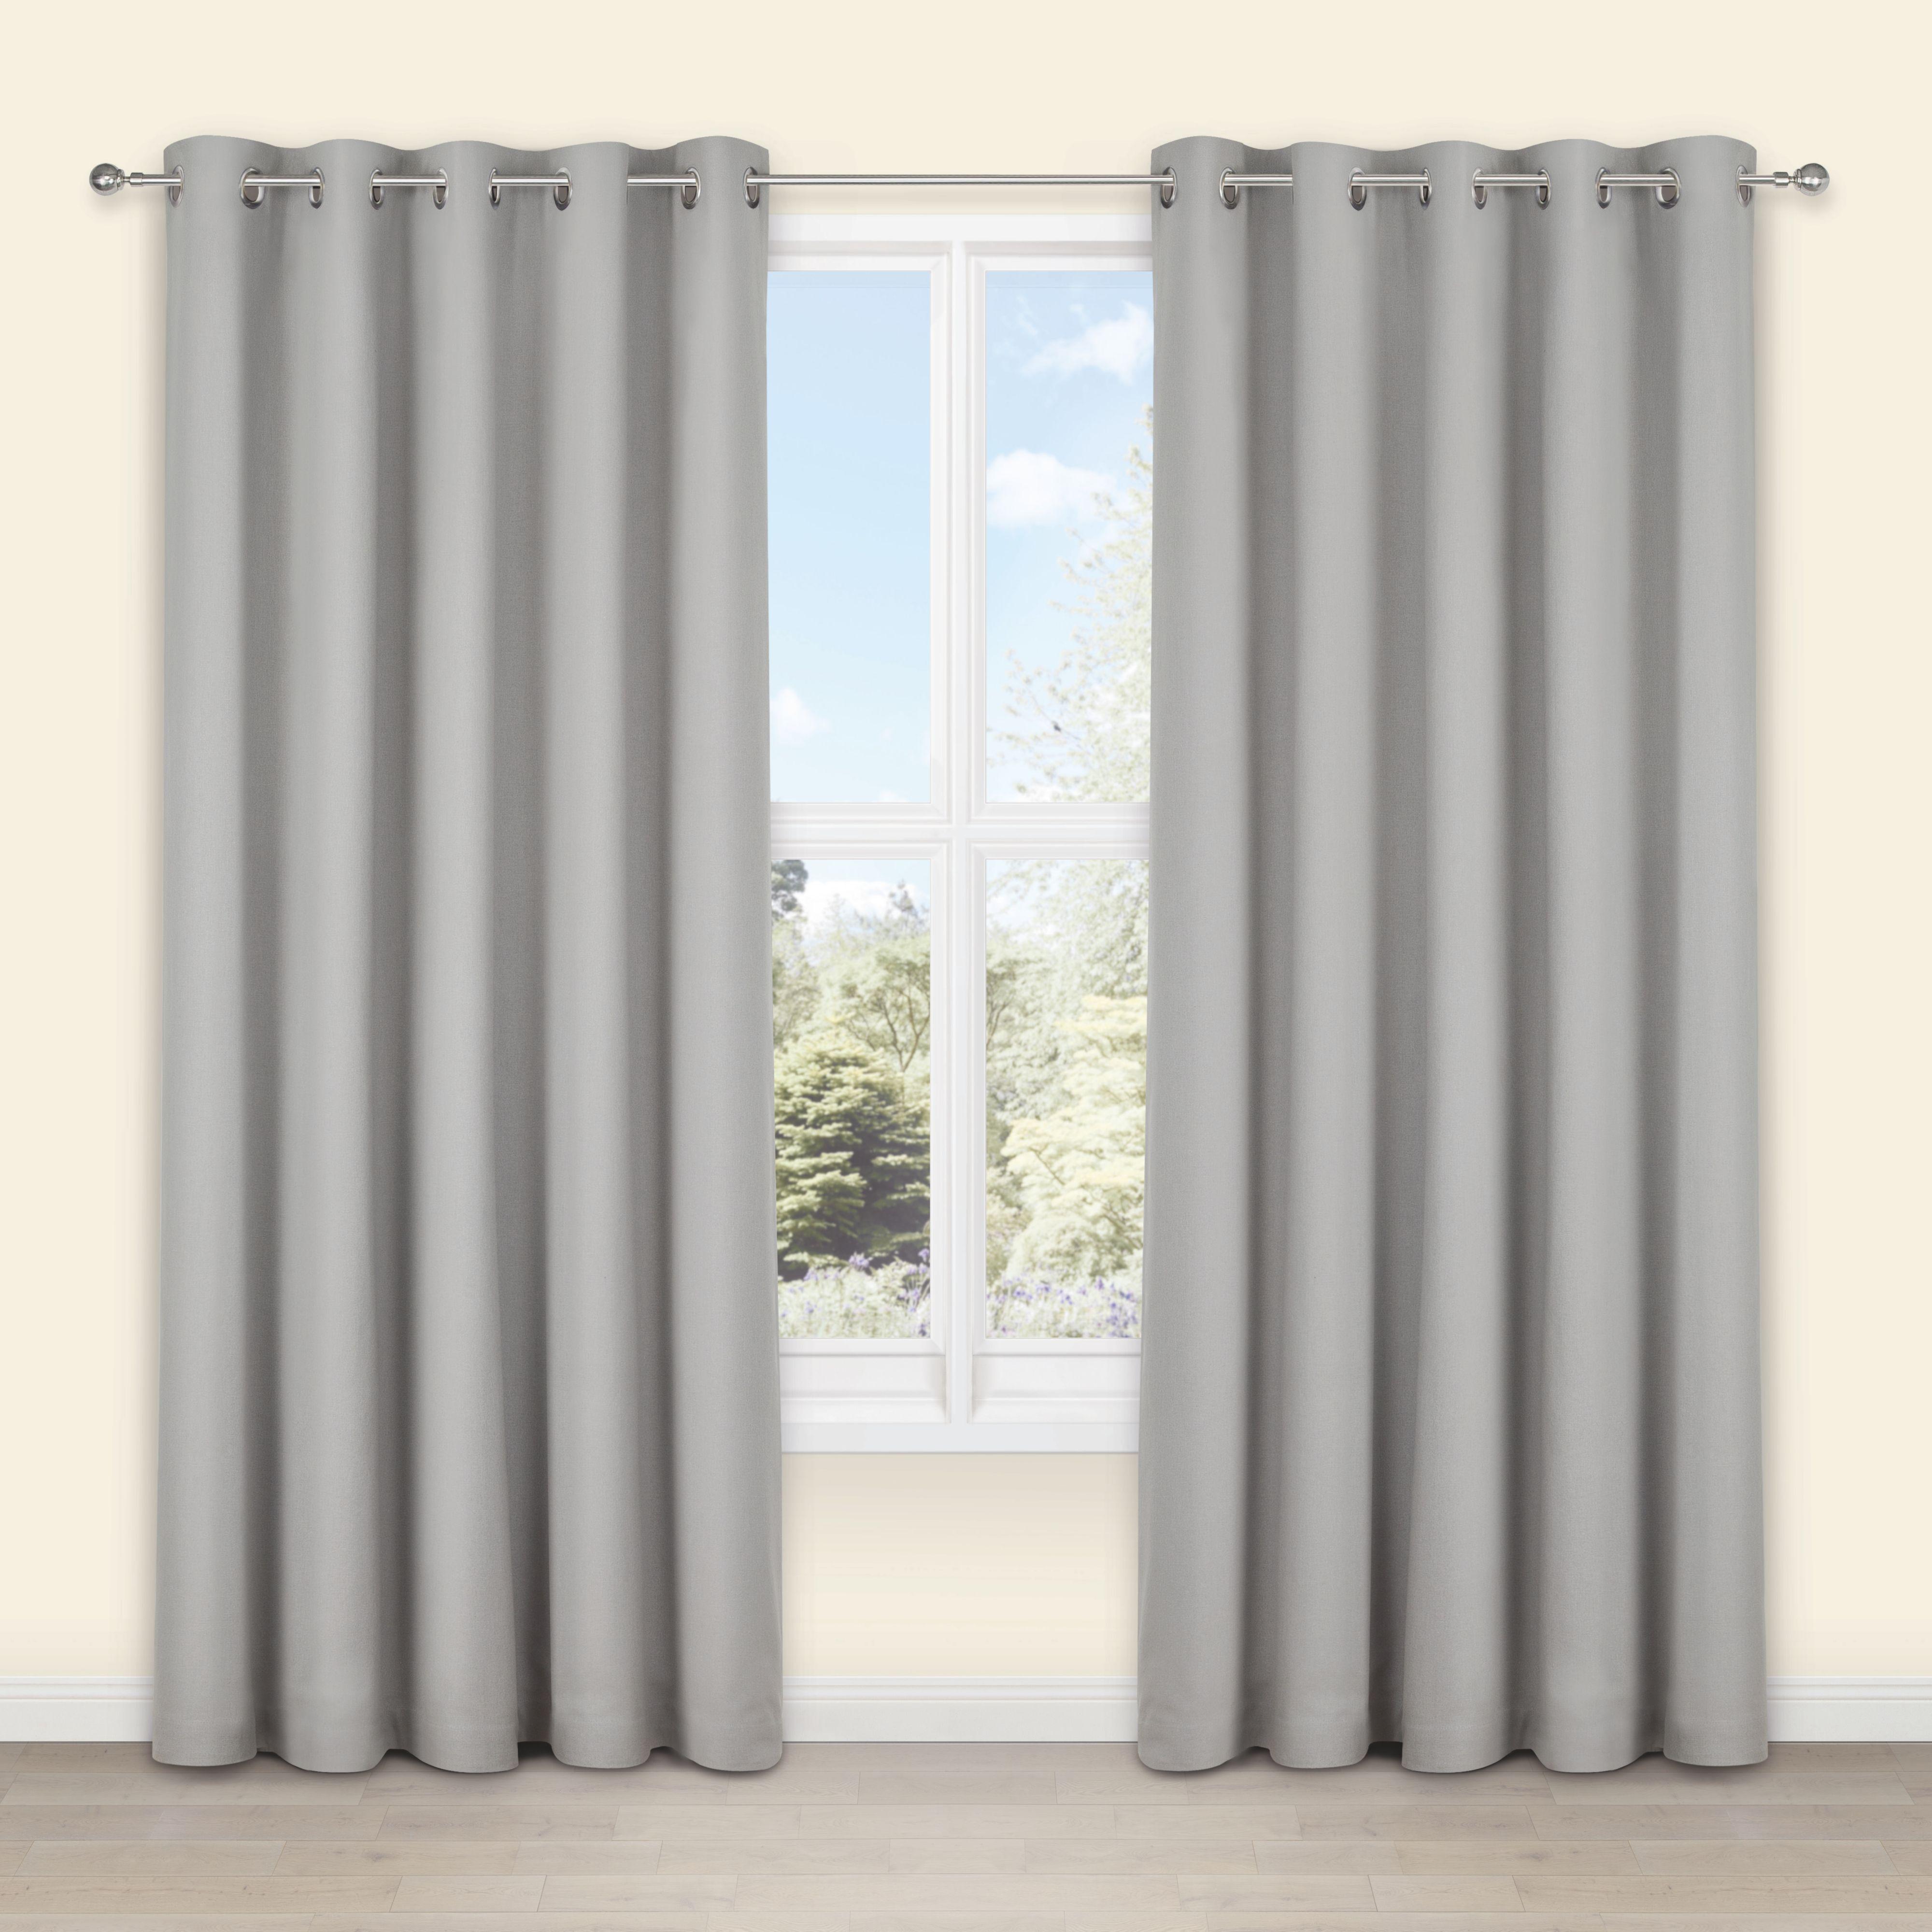 Salla Concrete Plain Woven Eyelet Lined Curtains W 117 Cm